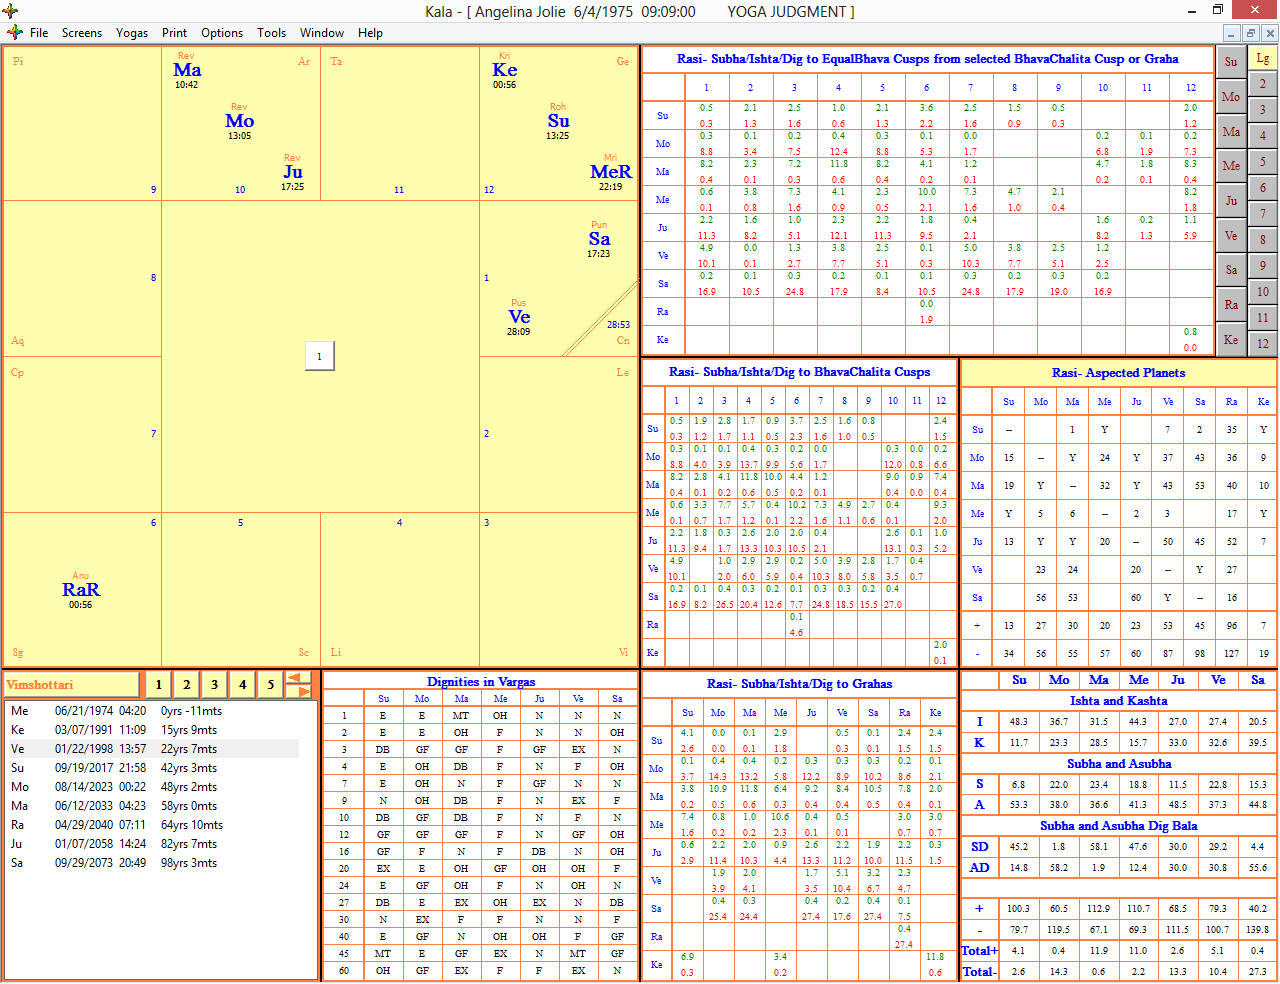 Yoga judgment kala software vedic astrology nvjuhfo Choice Image